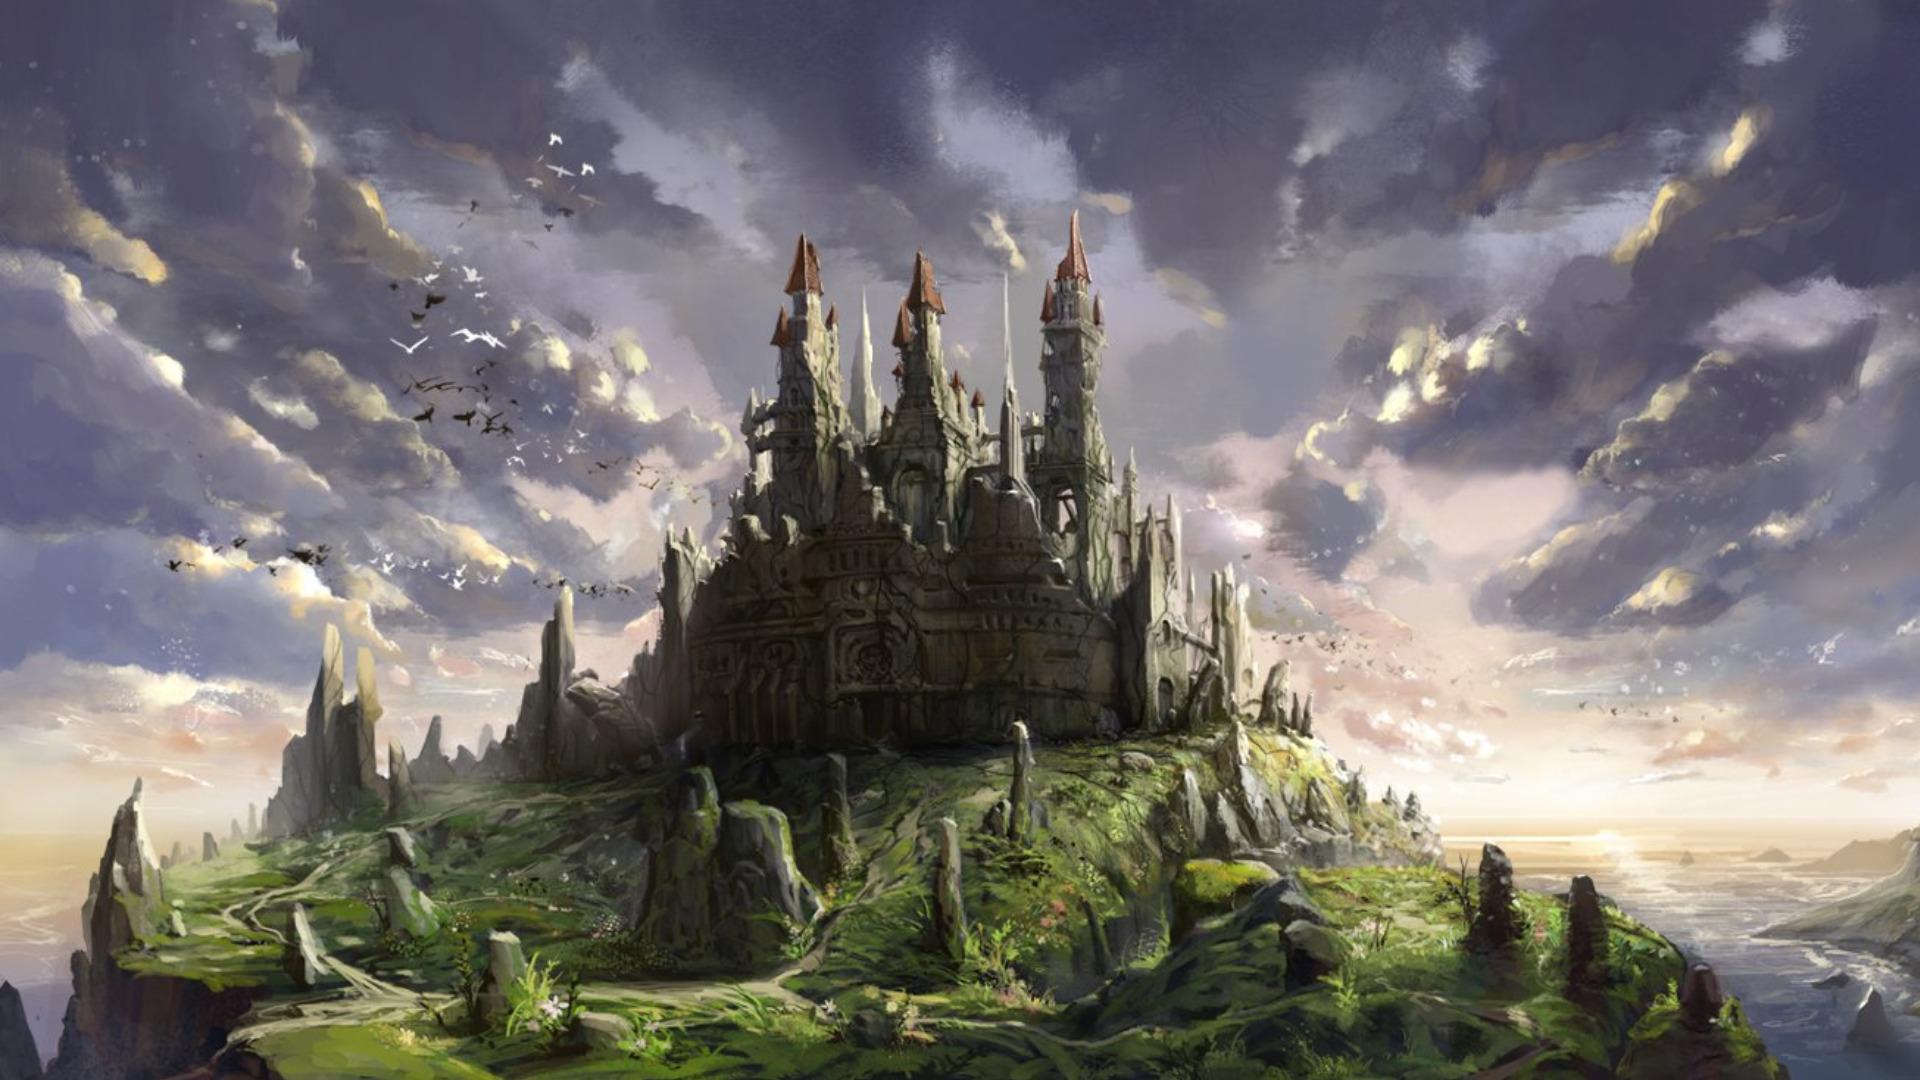 Fantasy castle wallpapers wallpapersafari - Fantasy desktop pictures ...